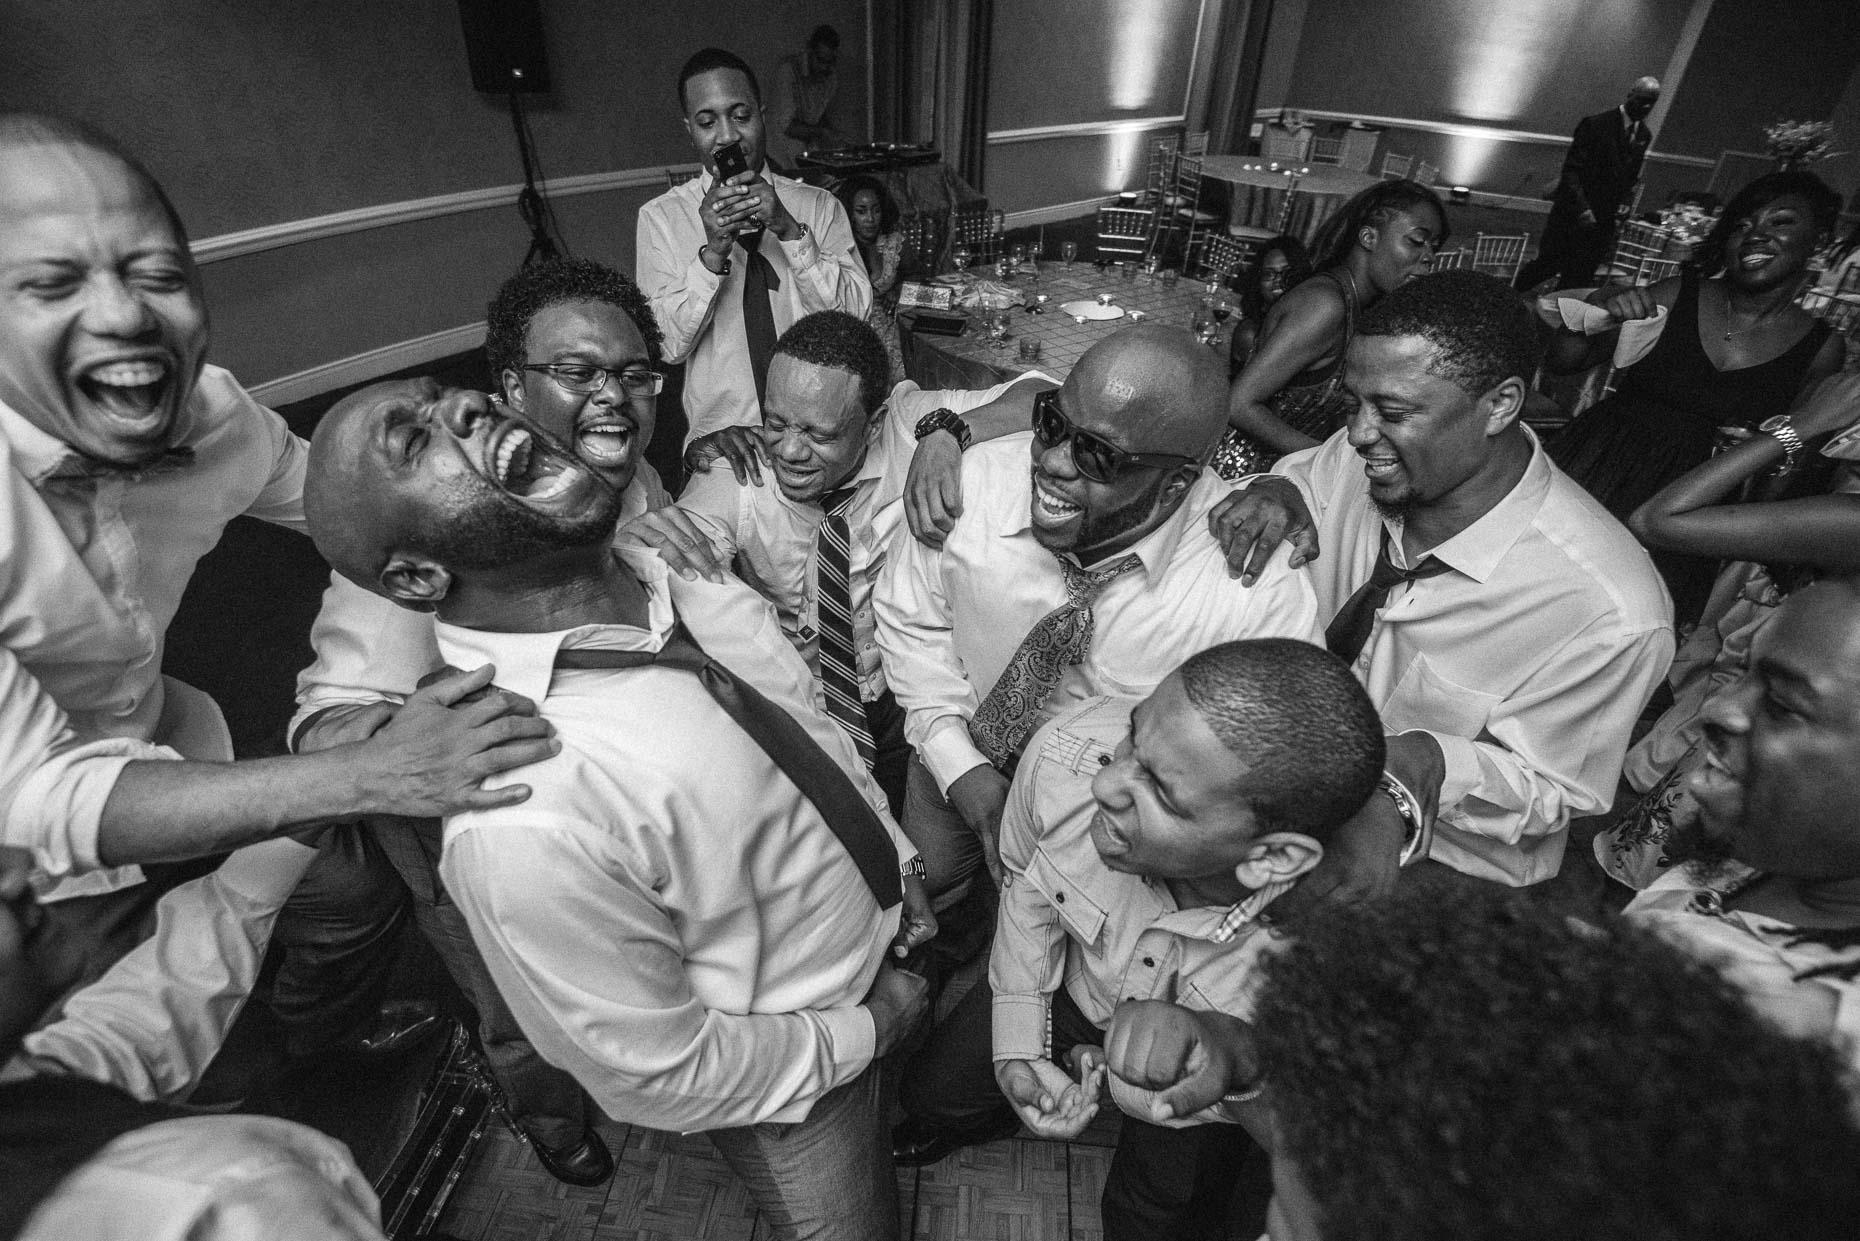 Weddings by Elliott O'Donovan - Washington DC_-26.jpg